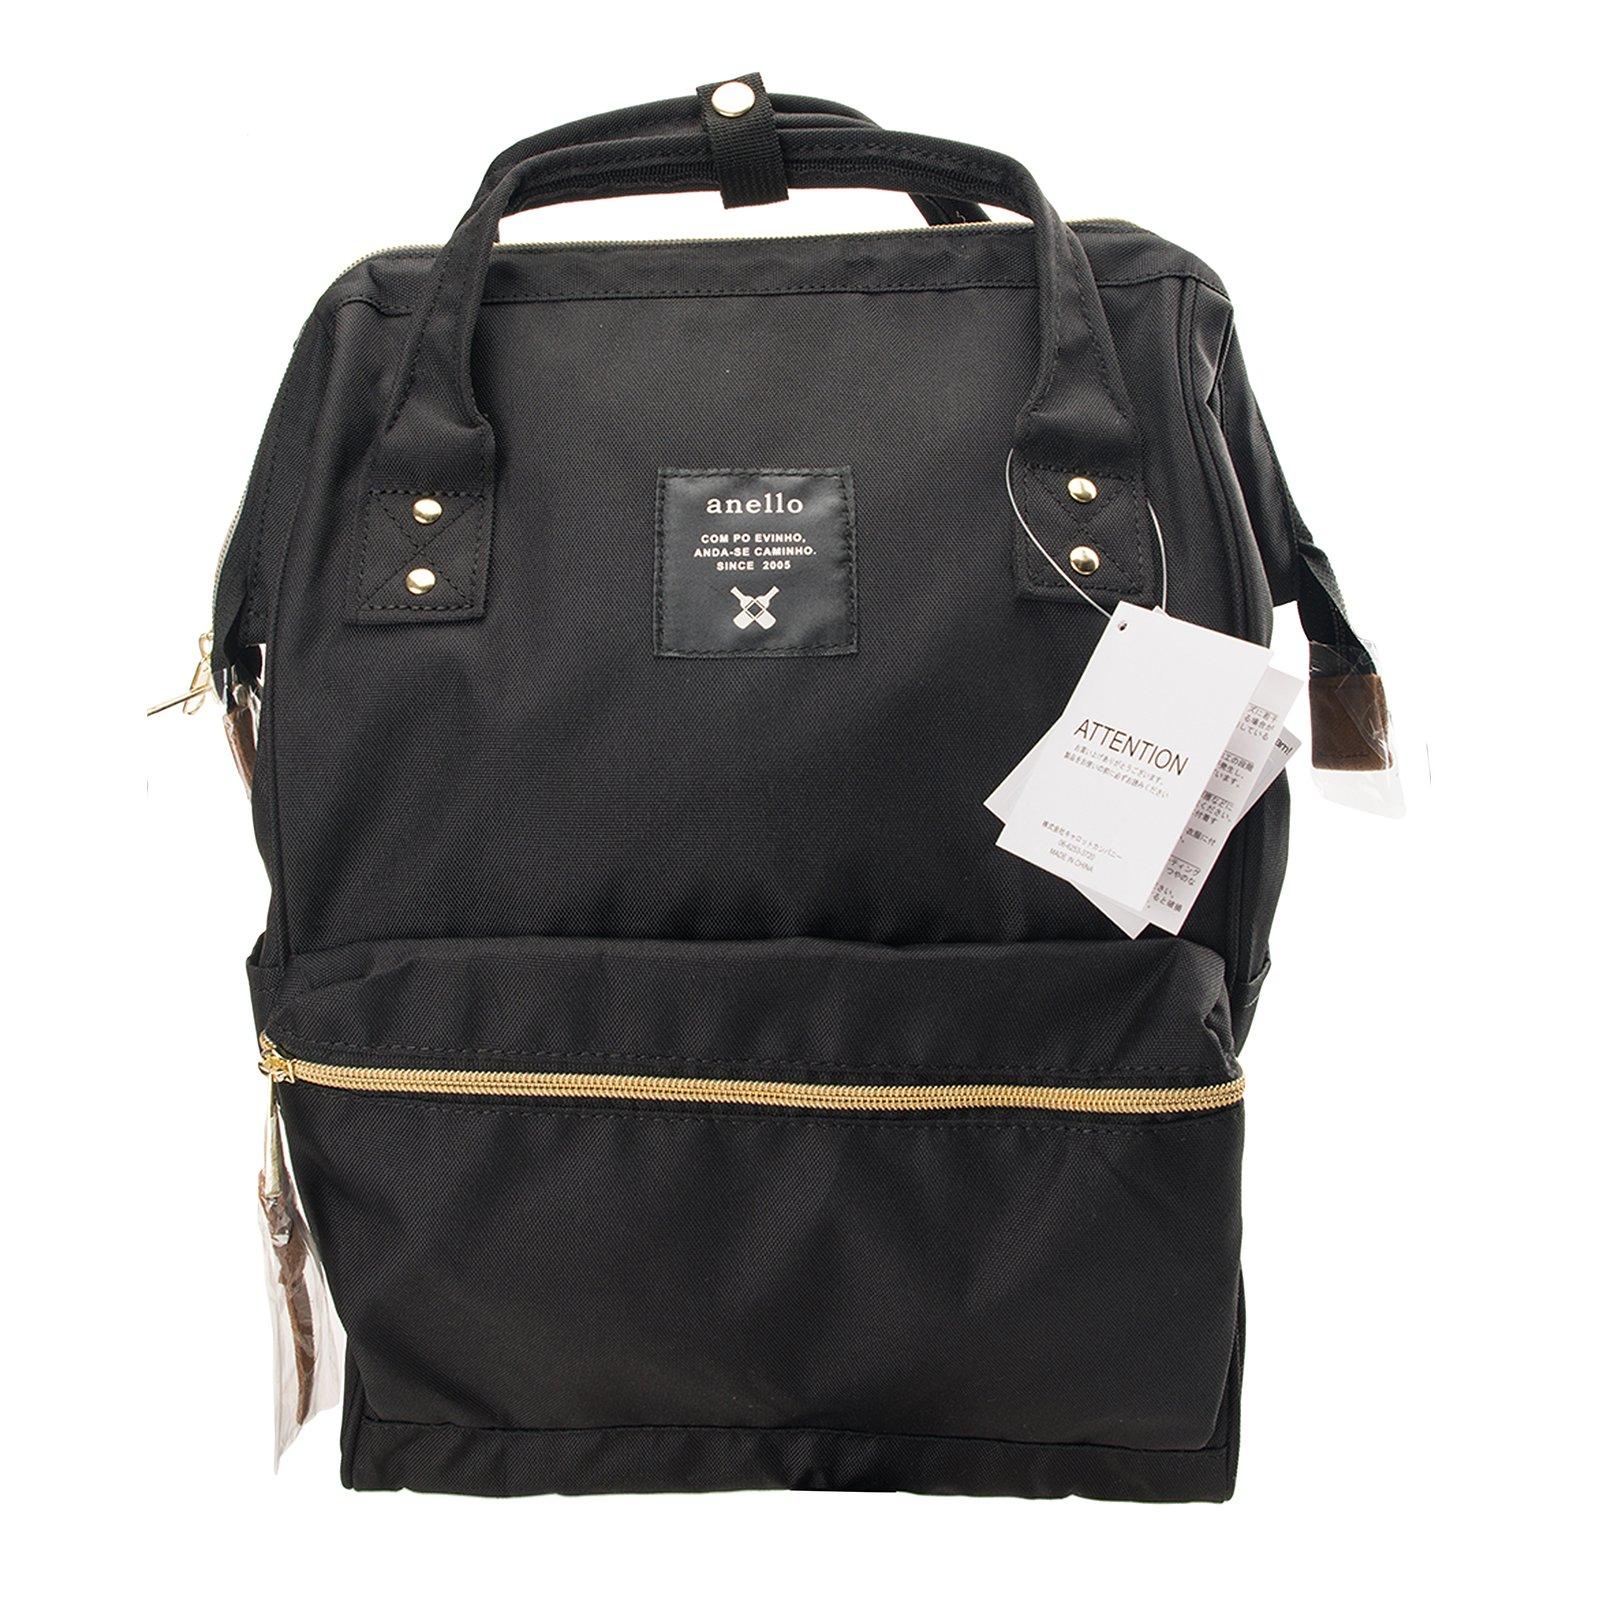 Anello Official Black Japan Fashion Shoulder Rucksack Backpack Casual Diaper Bag Unisex